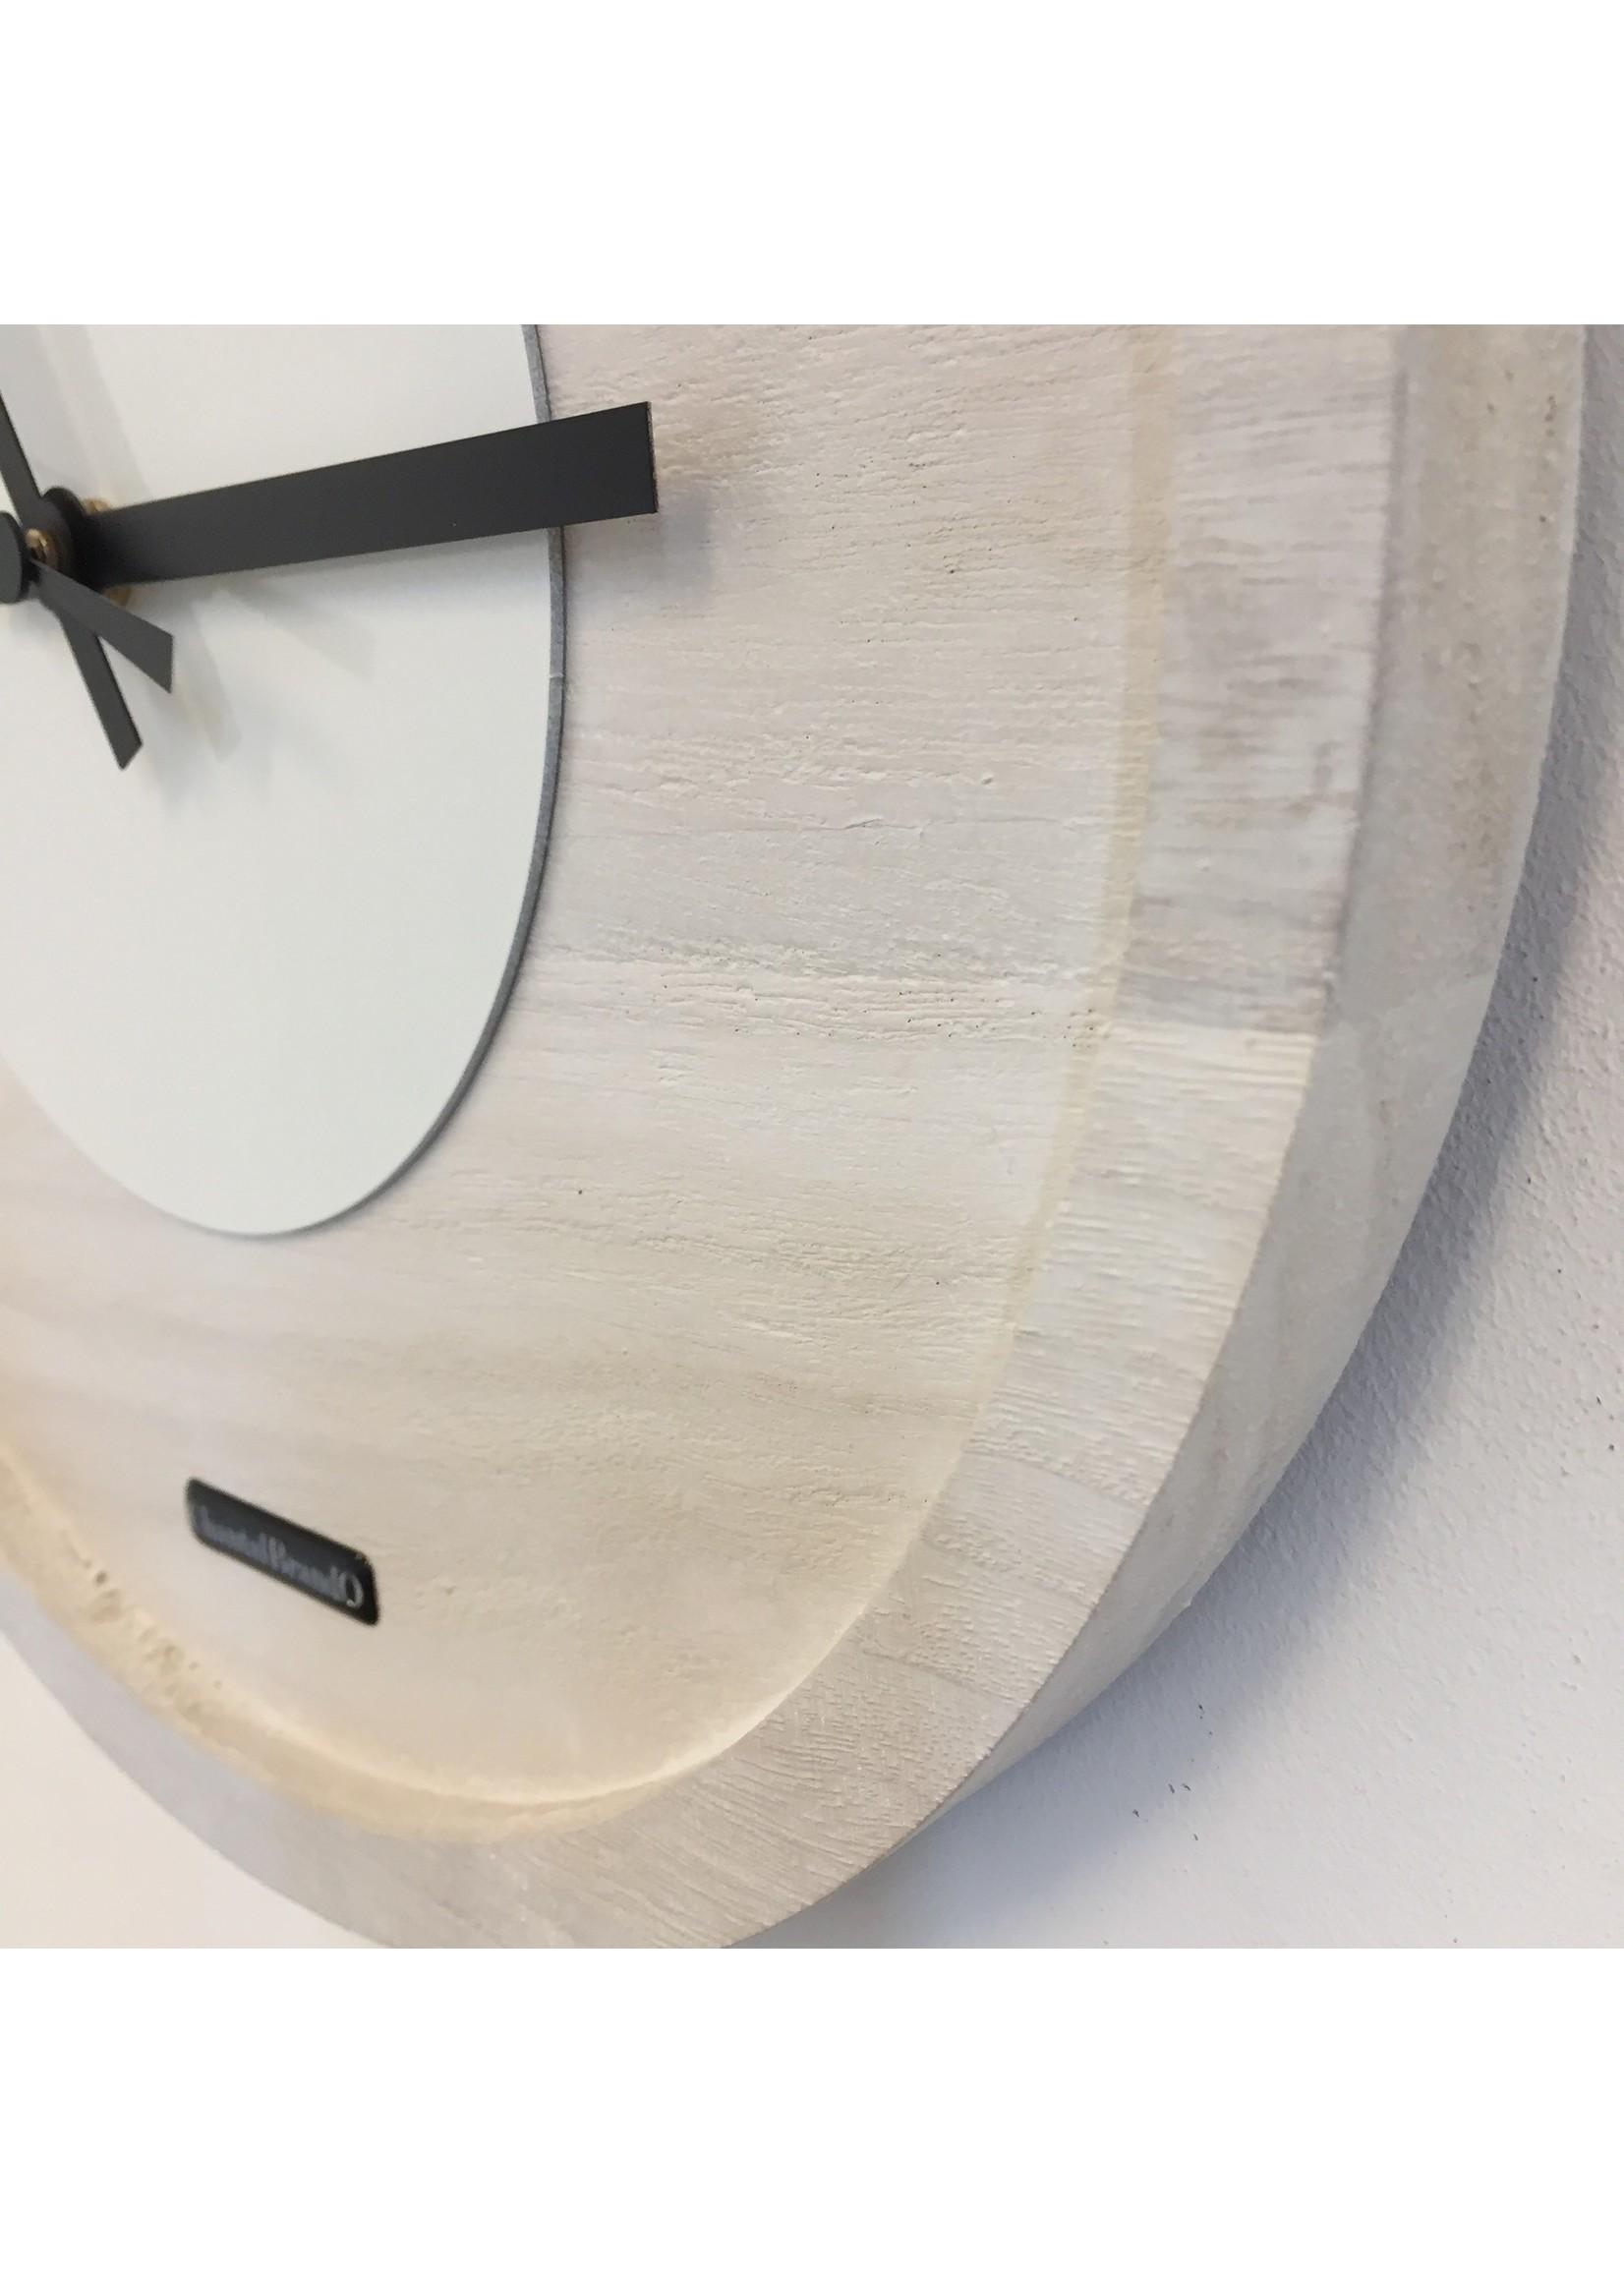 Klokkendiscounter Wandklok Quinten White On White Modern DUTCH Design